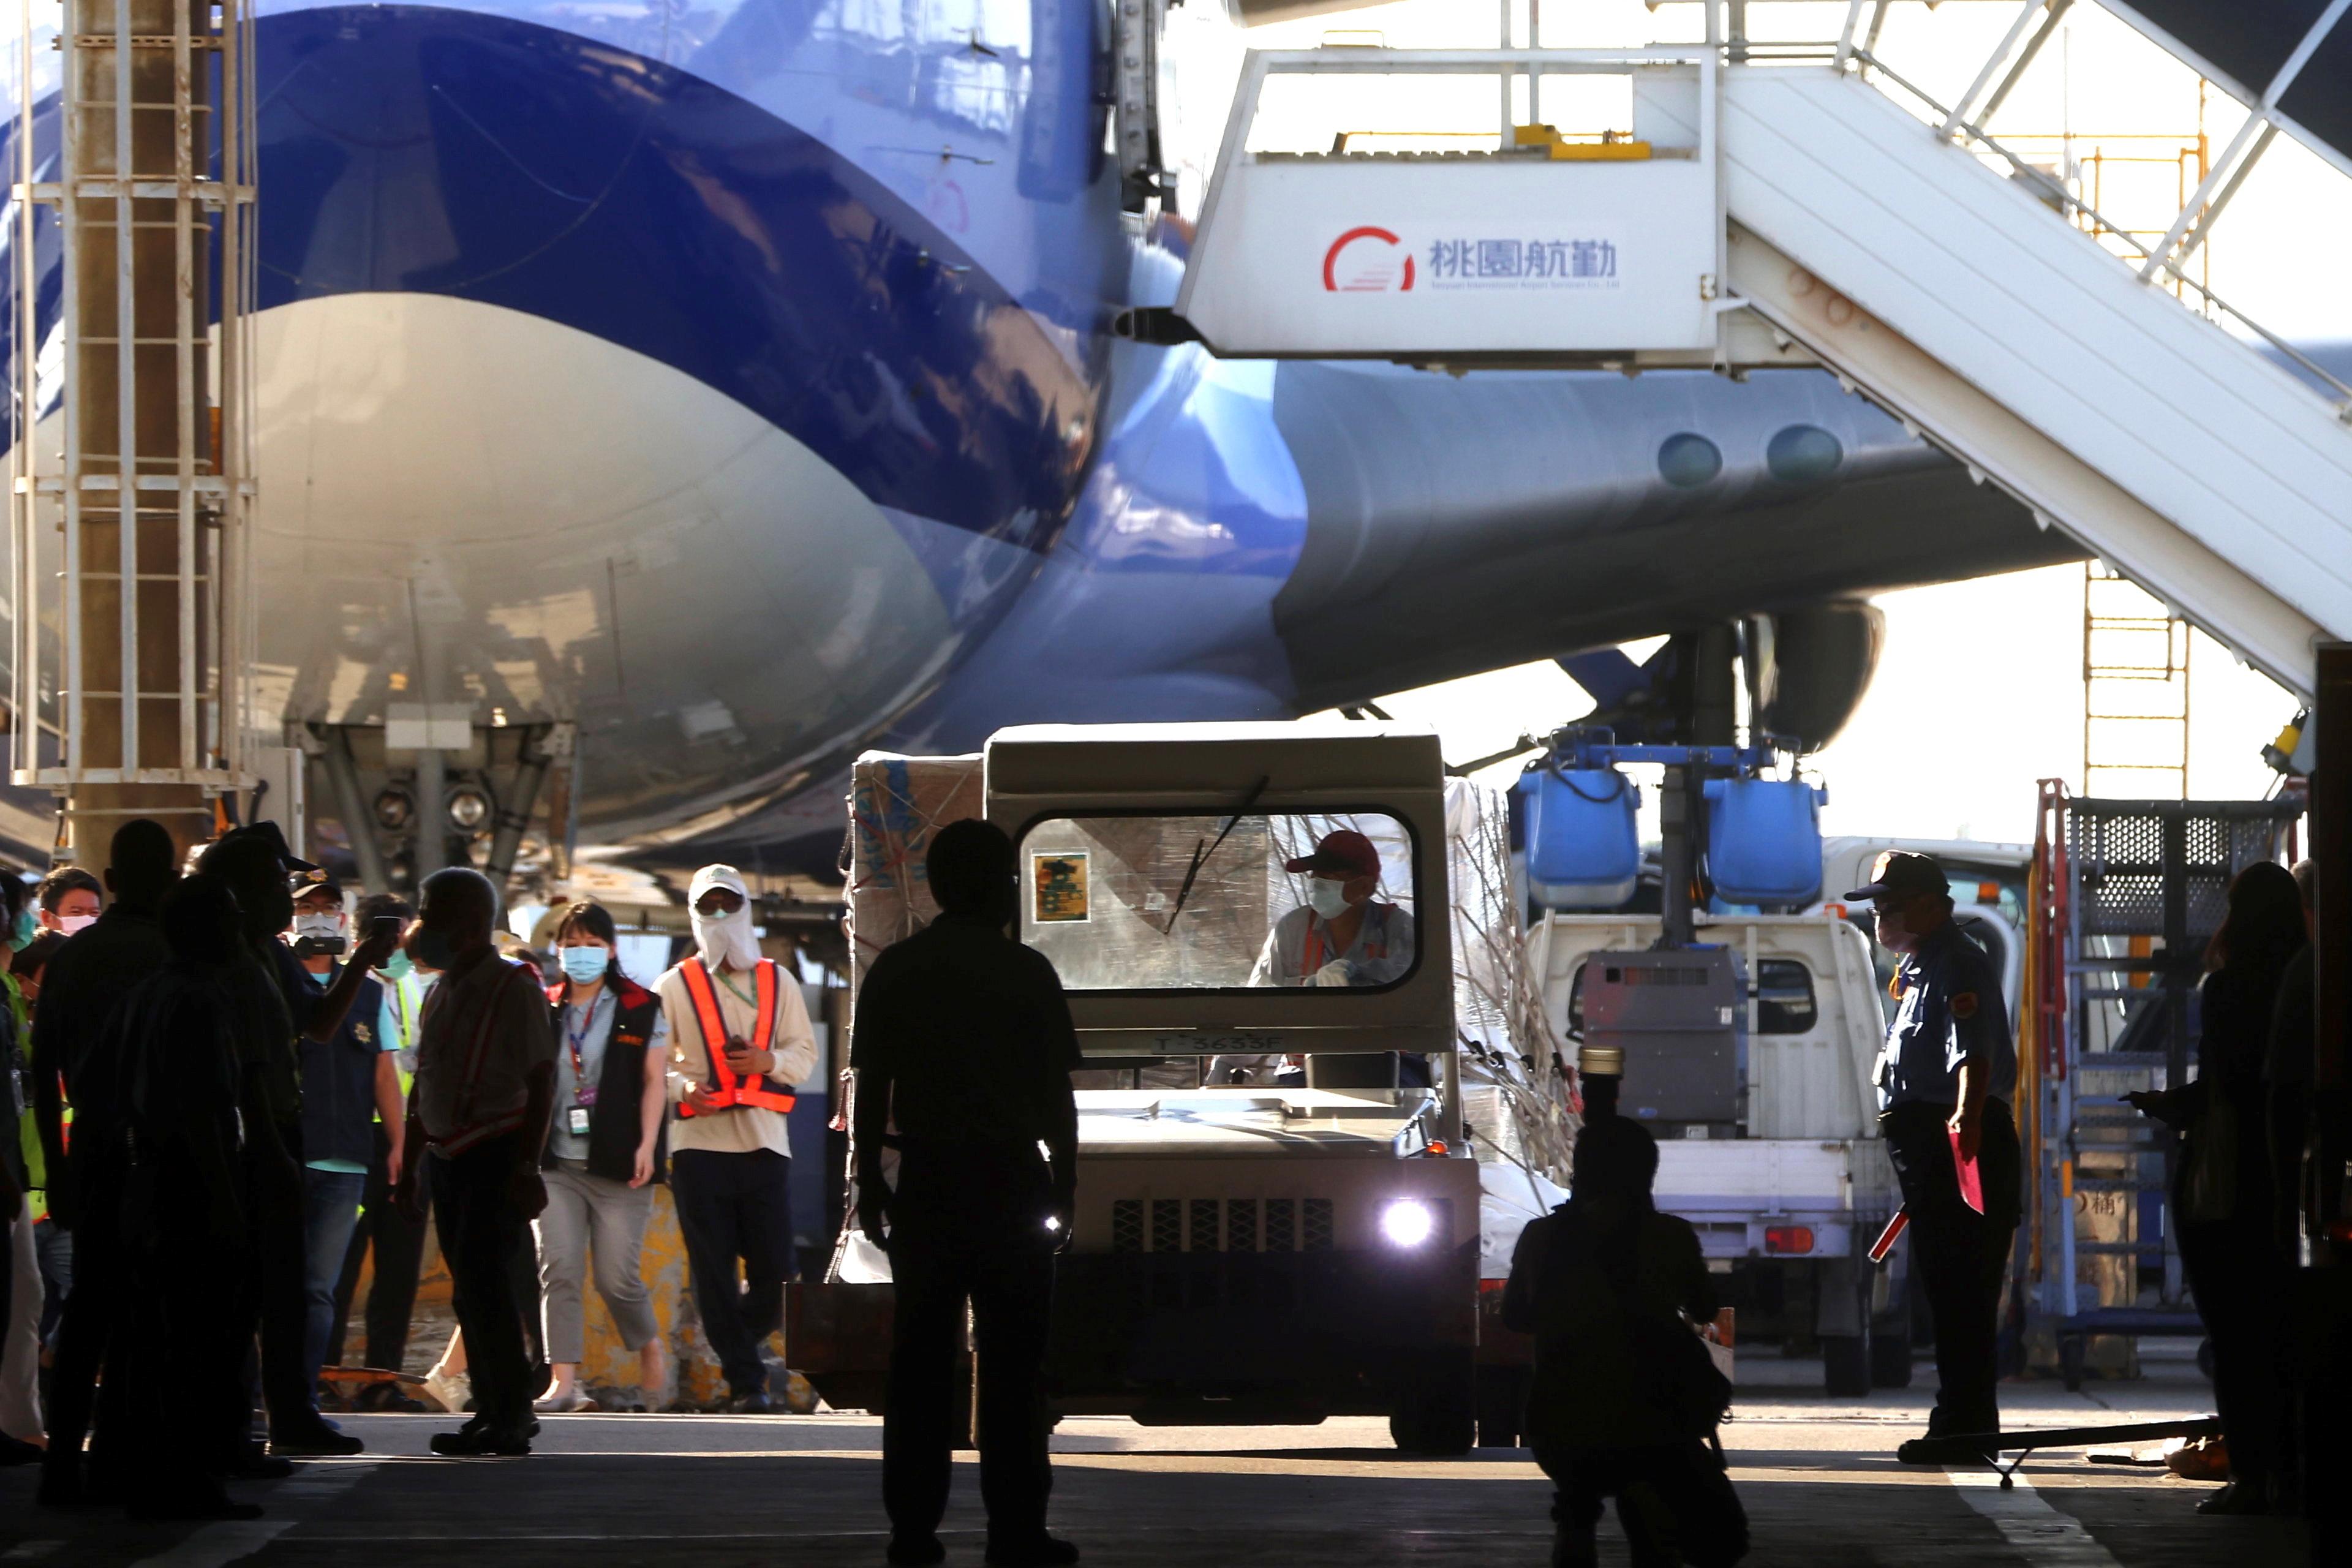 Workers transport Moderna vaccines against the coronavirus disease (COVID-19) to Taiwan Air cargo Terminal in Taoyuan, Taiwan, June 18, 2021. REUTERS/Ann Wang